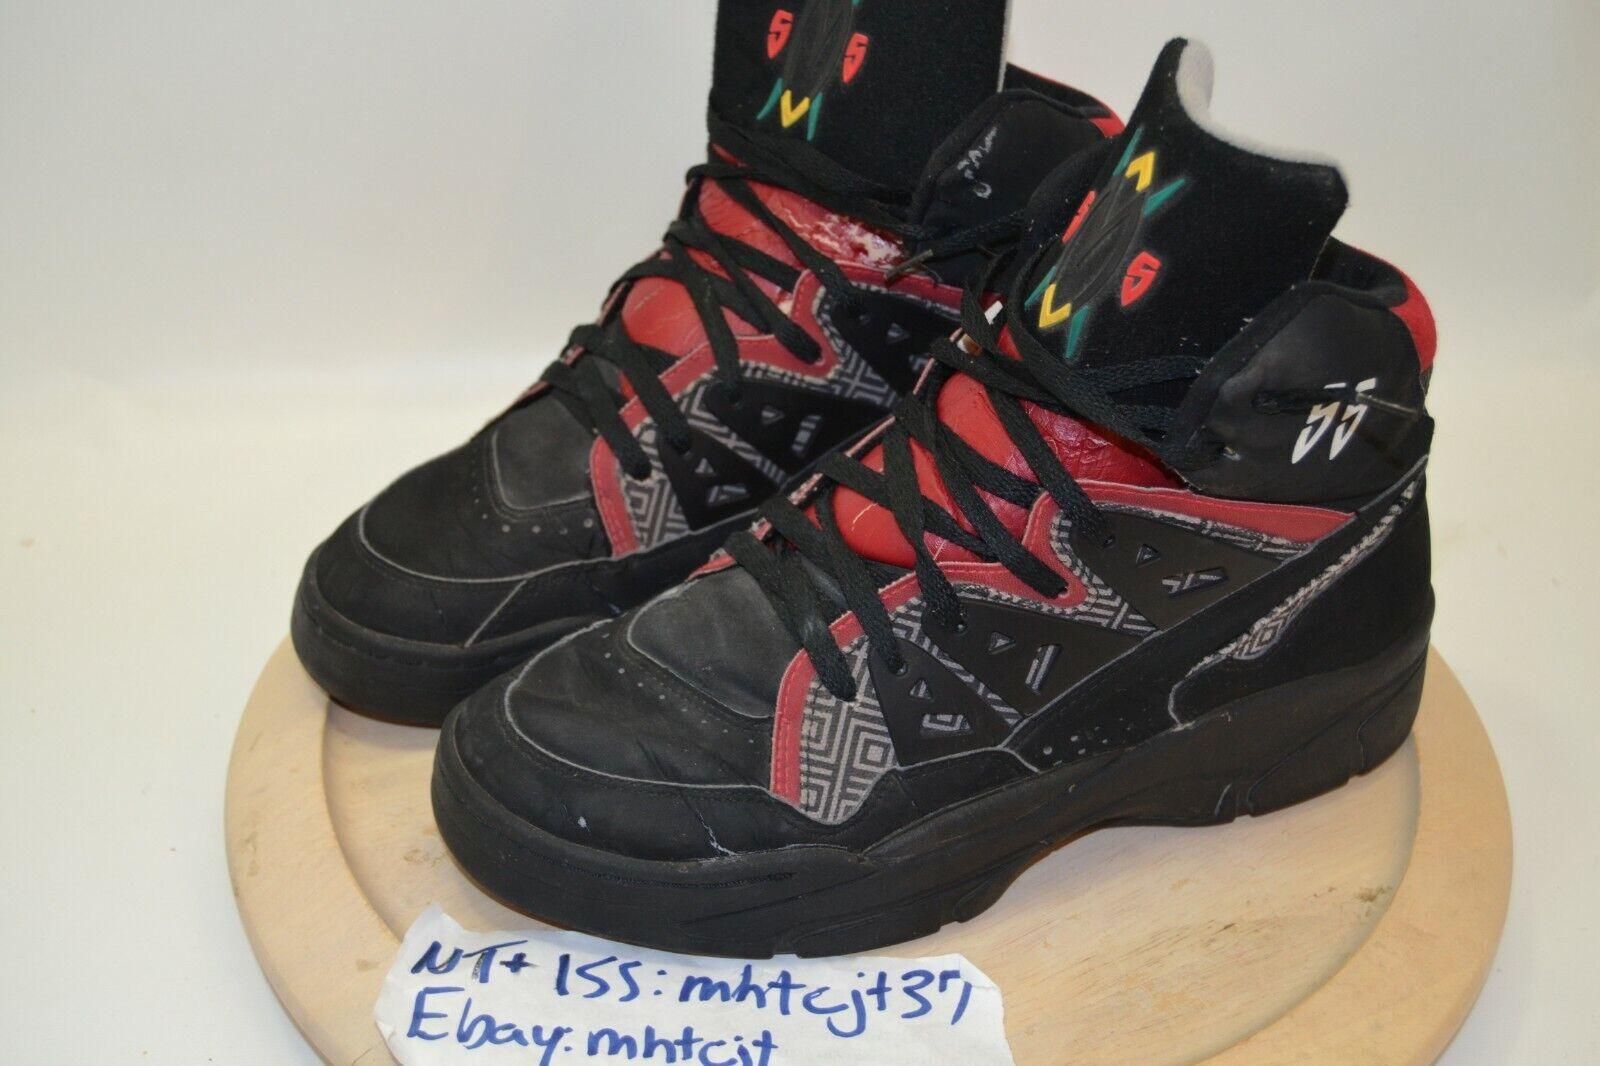 Adidas Original Vintage Mutumbo Sneakers 1993 sz 11.5 11 1 2